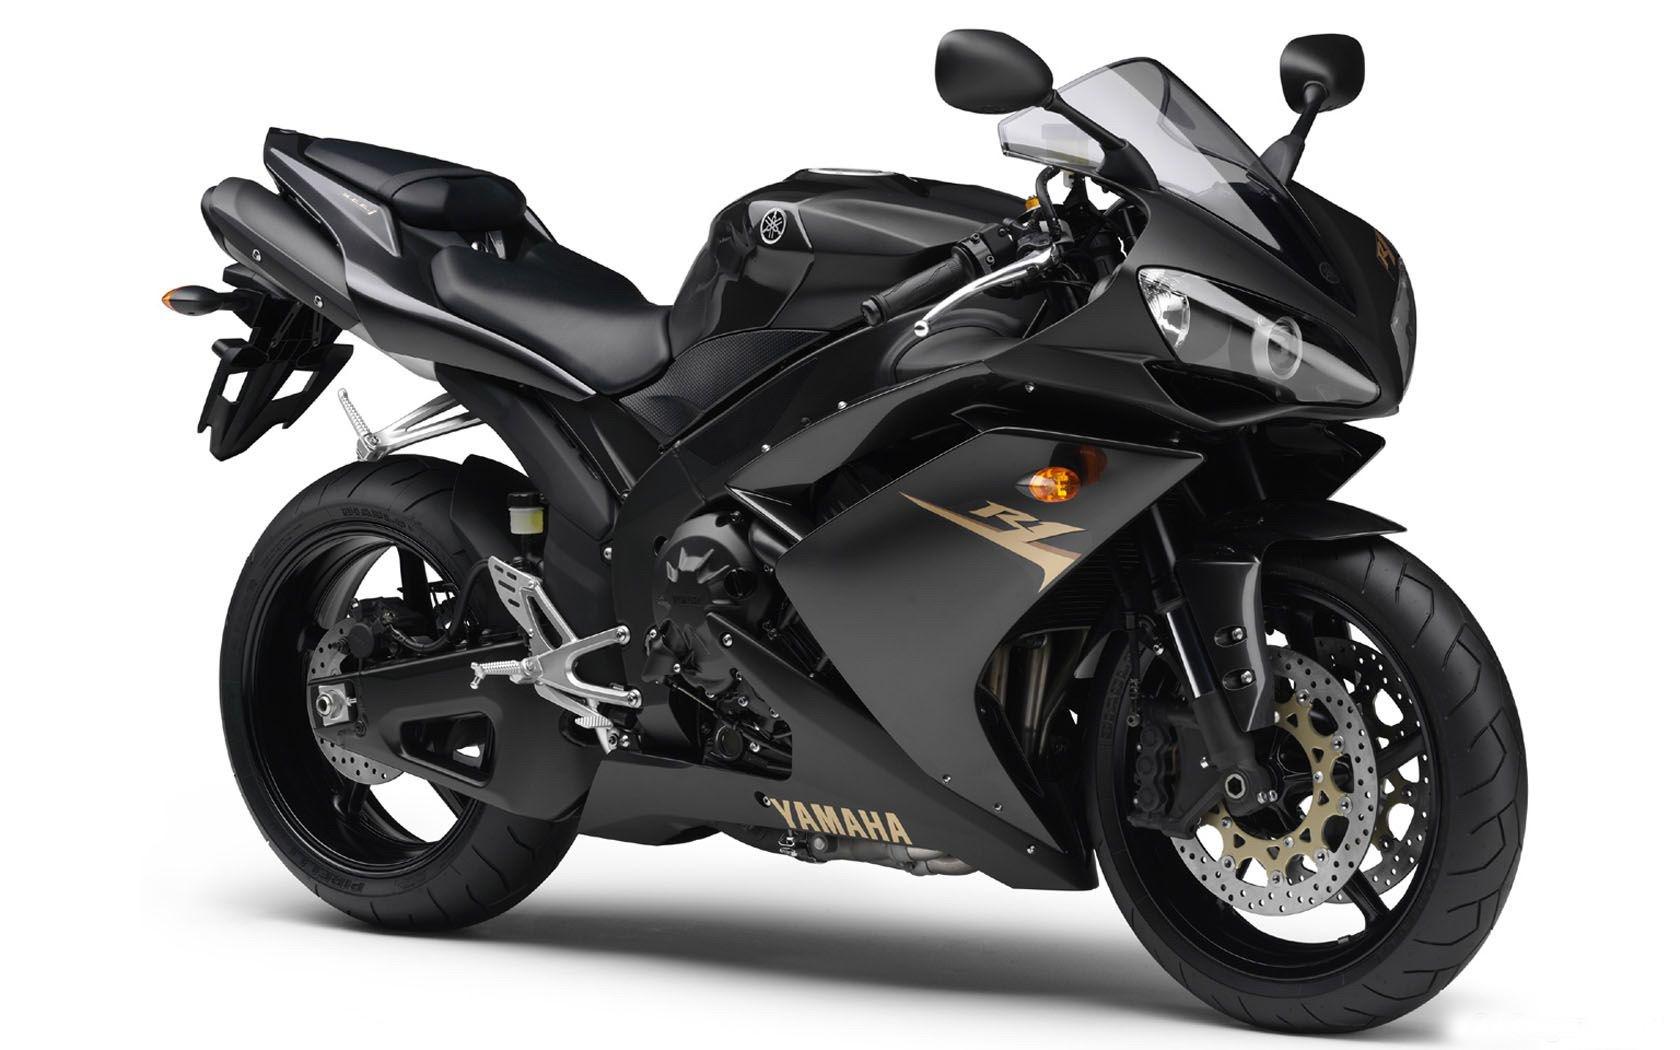 Black Yamaha R1 24736 Hd Wallpapers in Bikes   Imagescicom 1680x1050